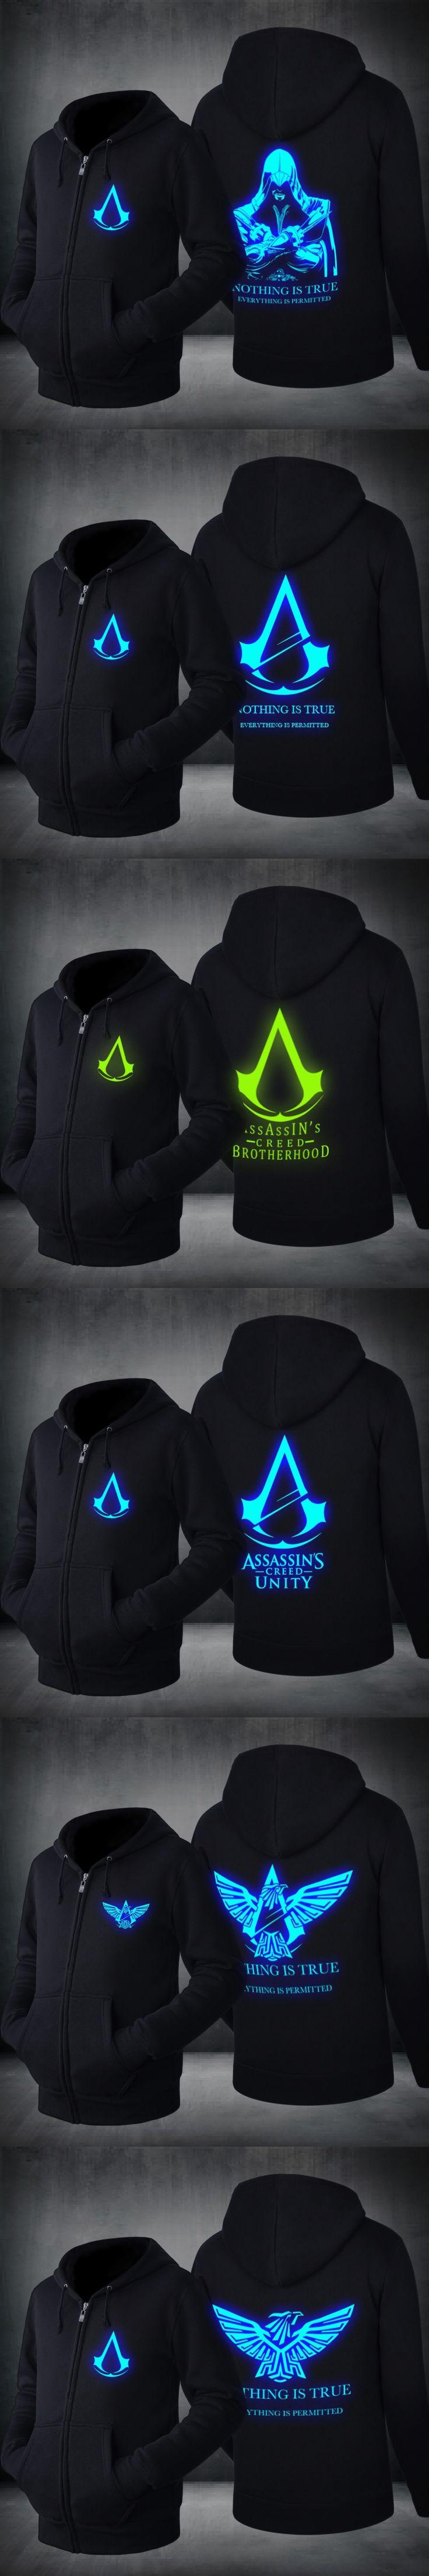 2017 Novelty Hoodies mens fashion sweatshirts assassins creed hoodie luminous pattern Luminous Hoodies Spring&Autumn US EU Size